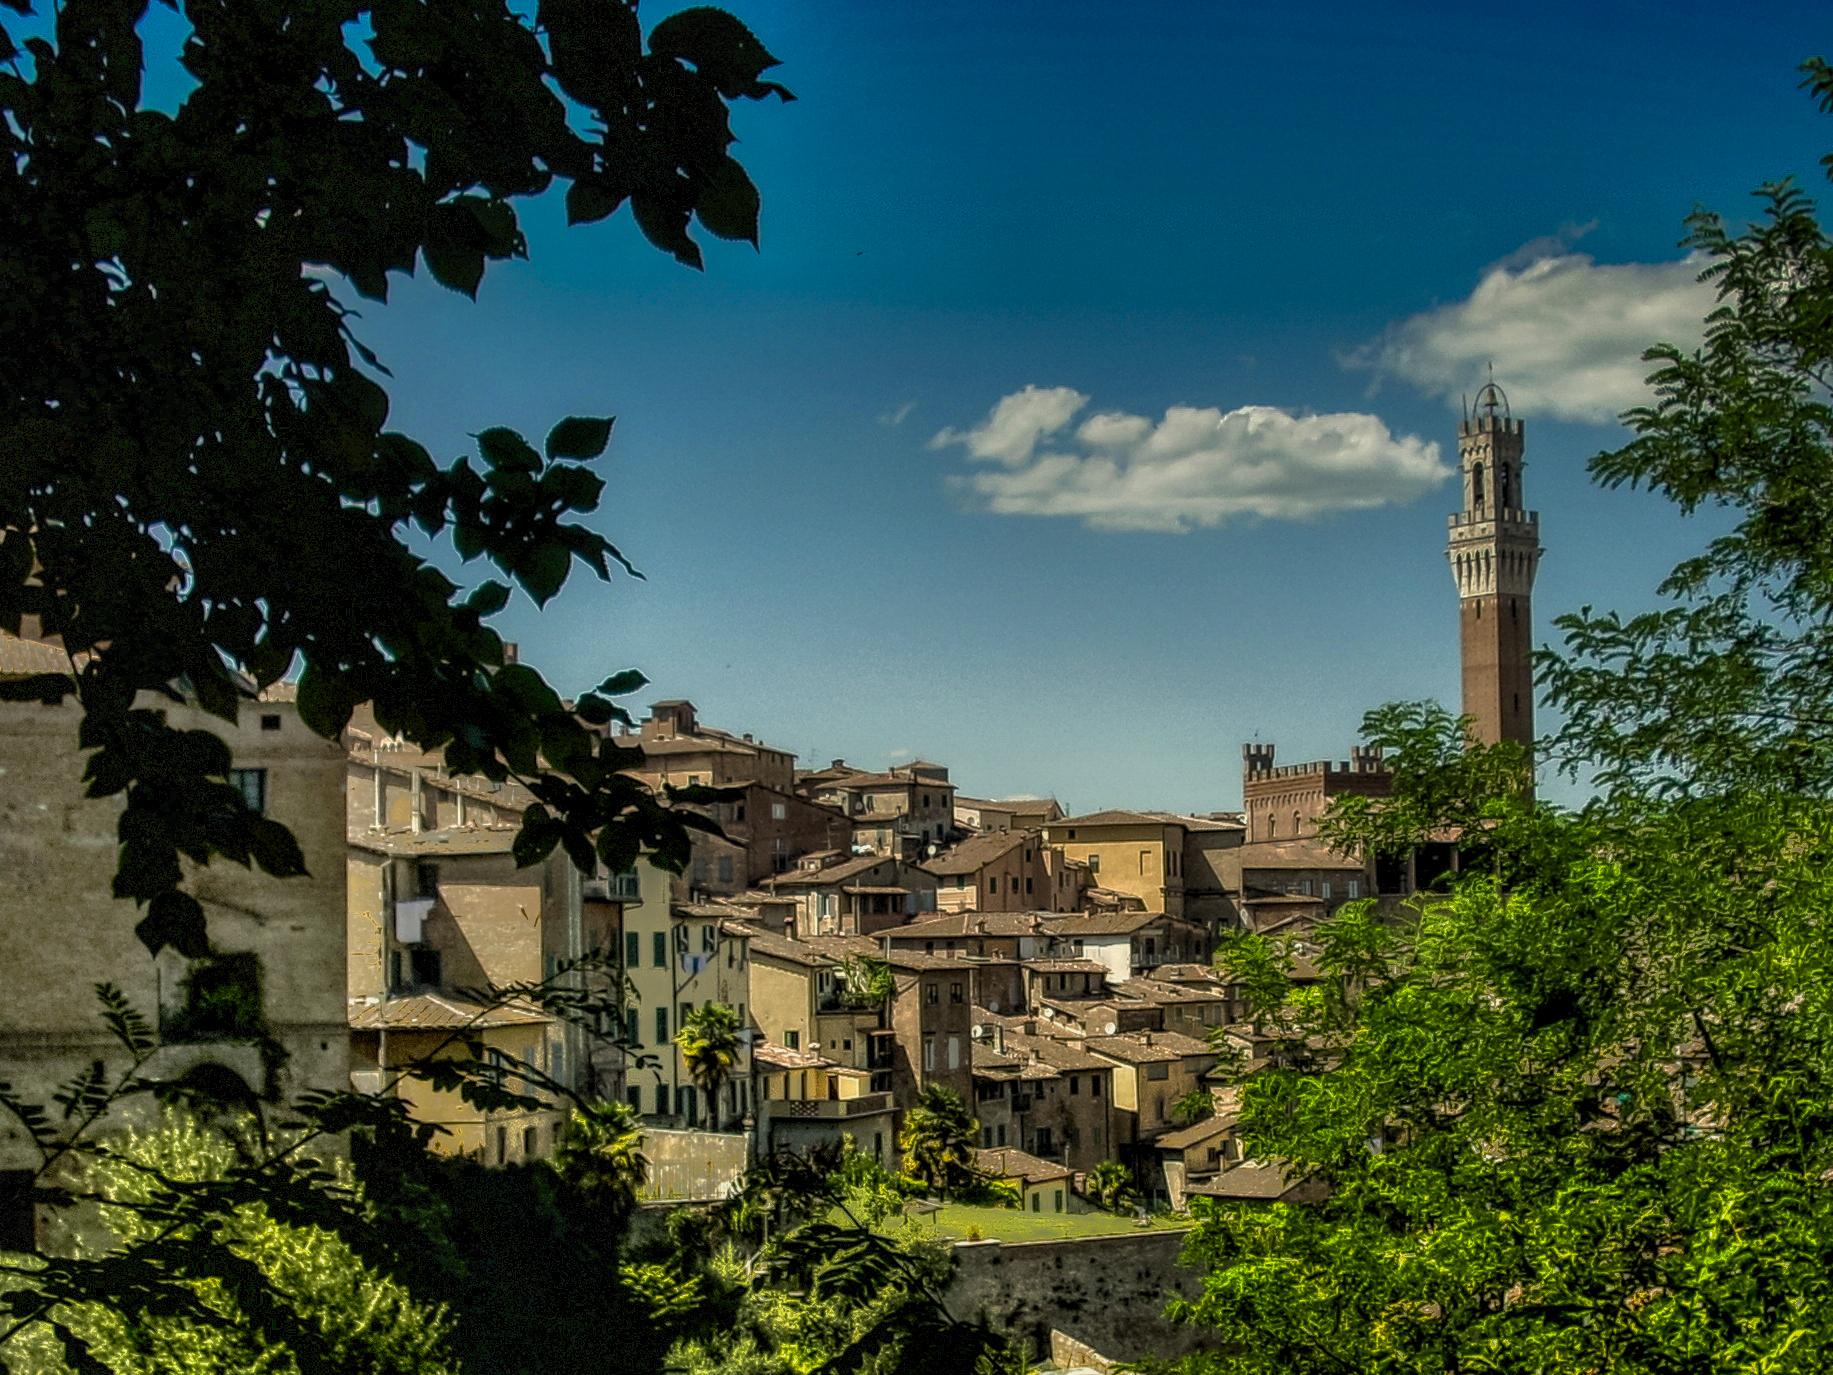 Toscana, Italia, viajes